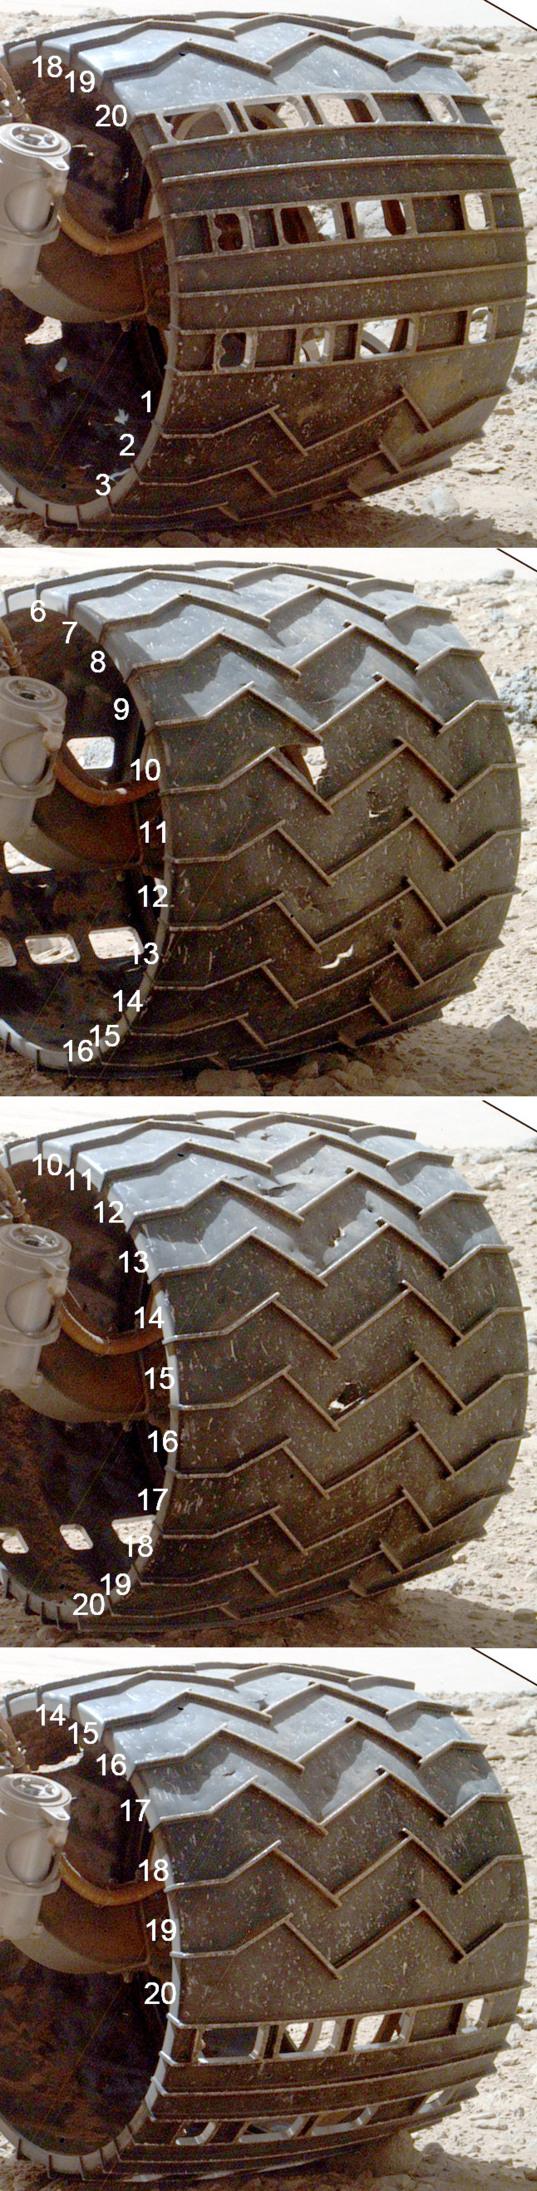 Curiosity wheel survey, sol 513: Left middle wheel